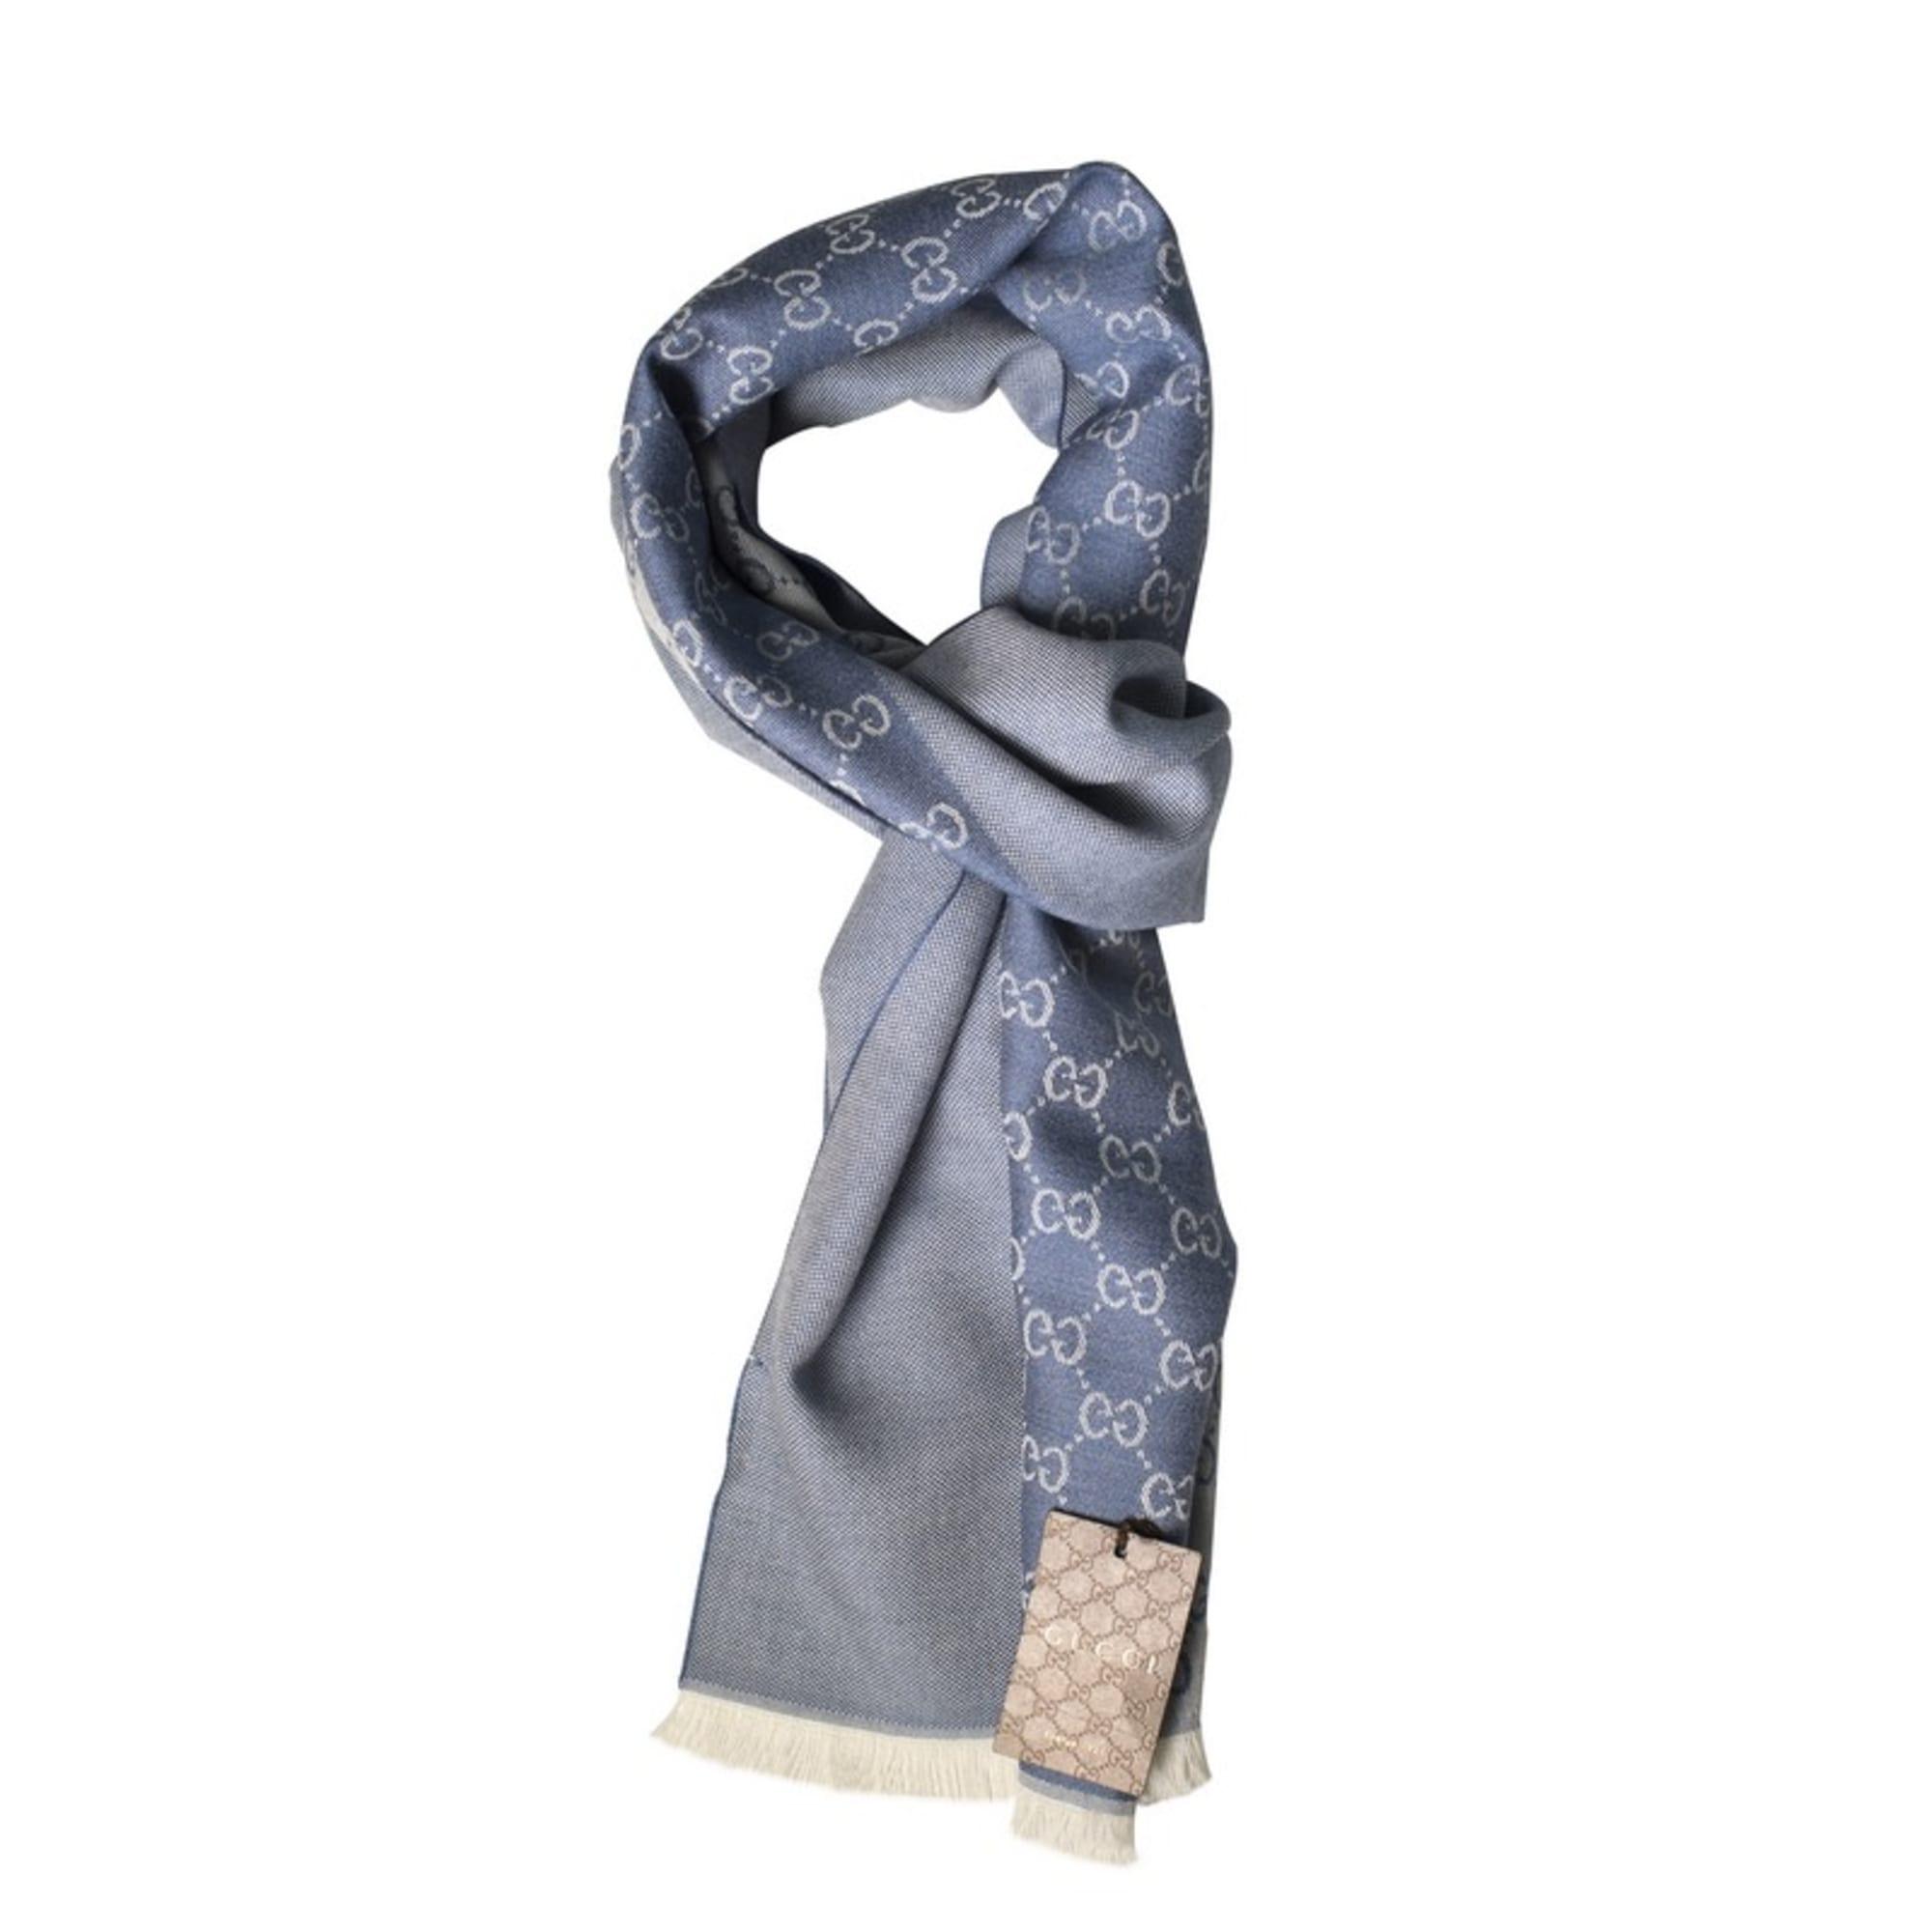 Echarpe GUCCI bleu vendu par Dress-code 75 - 7608502 1c44cf04b4e